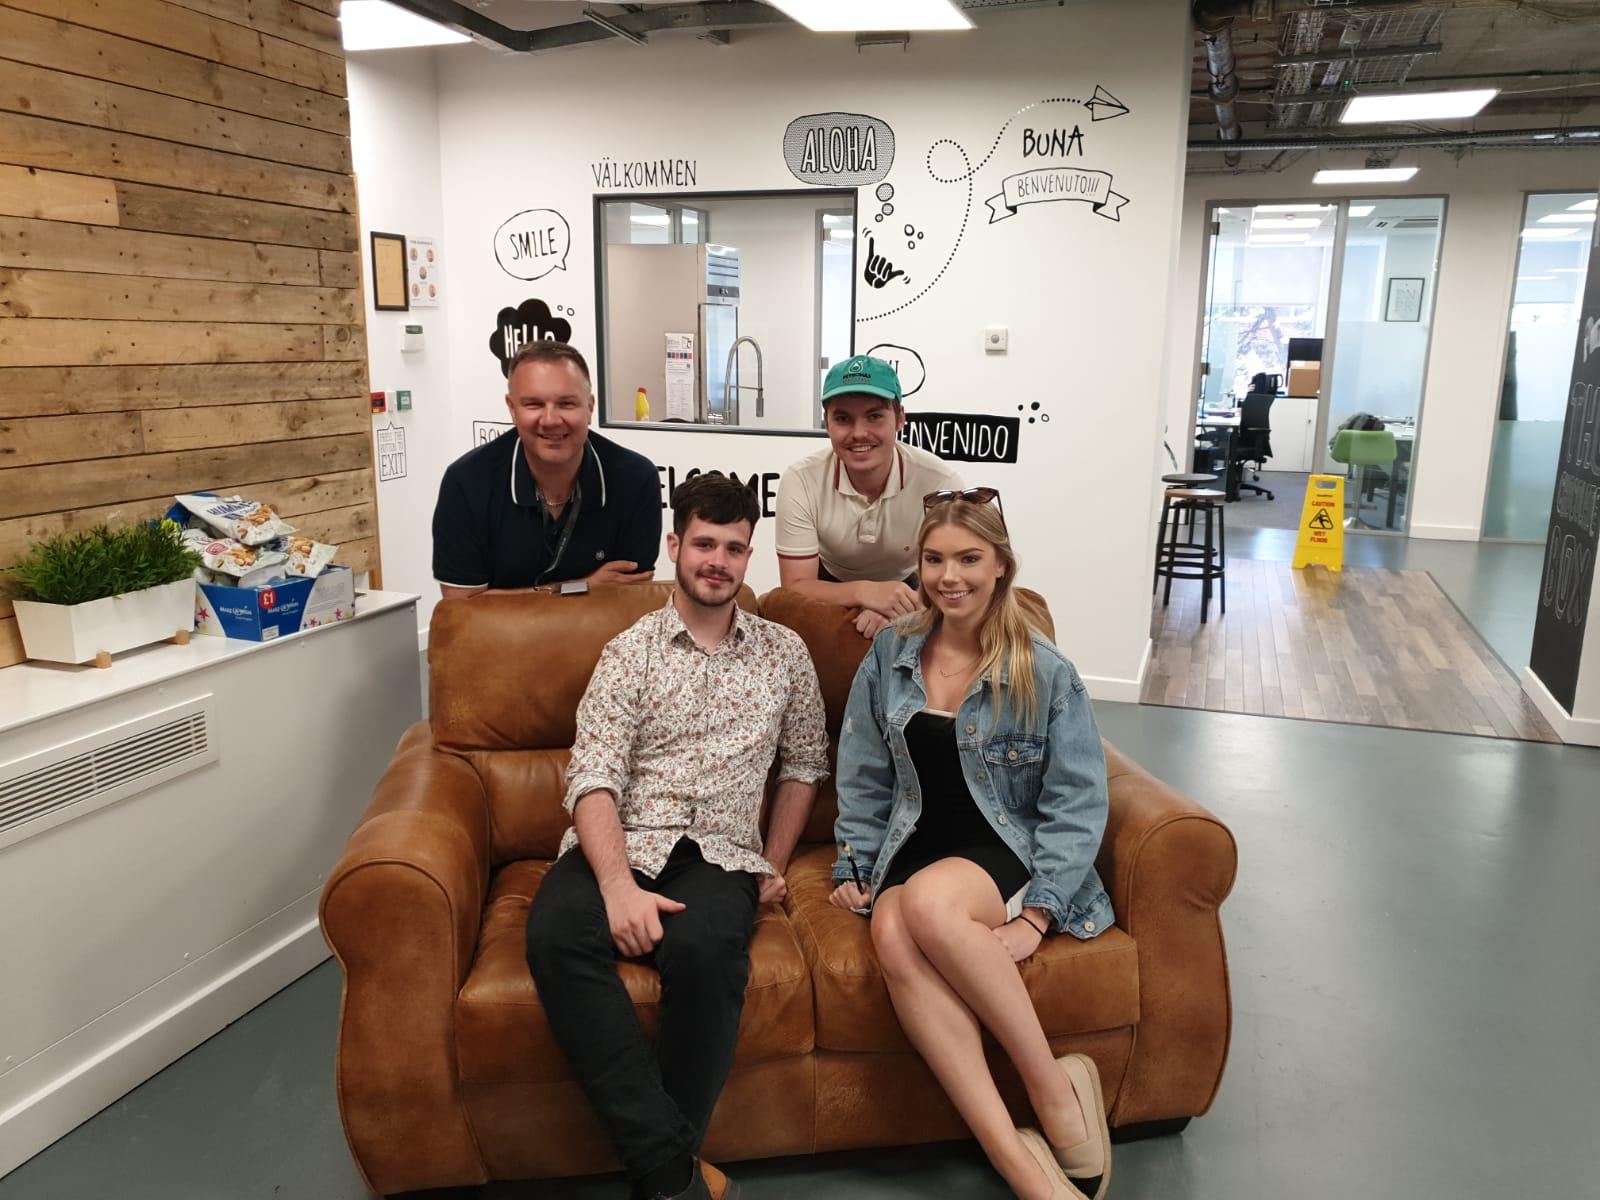 Fiona Carey, Matt Jenkins, Darren Northeast, Theo Meddelton